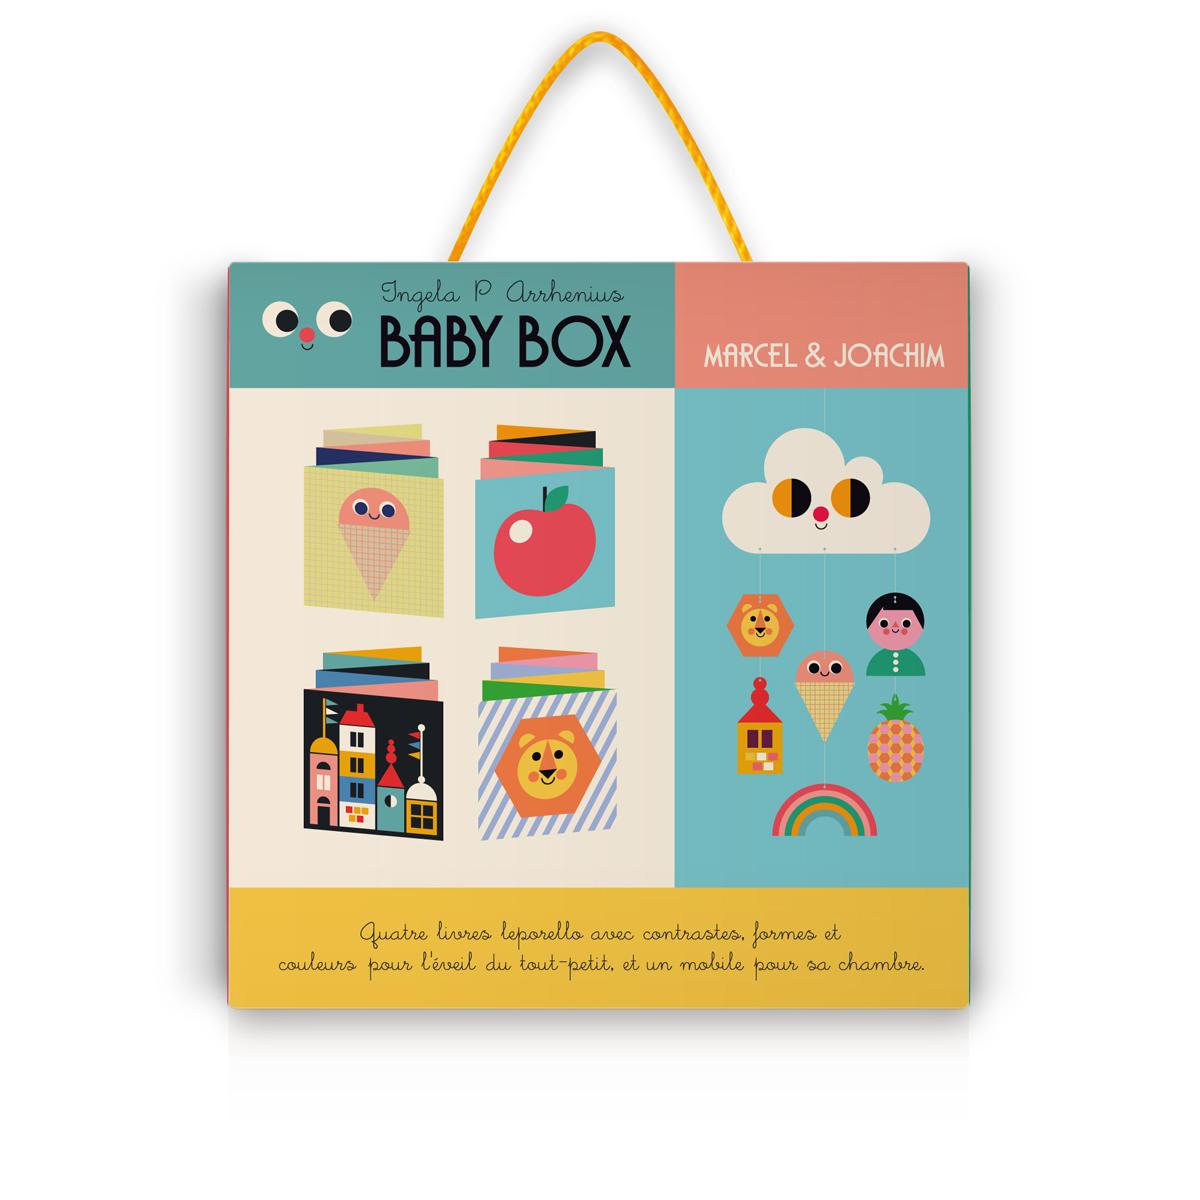 Livre & Carte Baby Box par Ingela P. Arrhenius Baby Box par Ingela P. Arrhenius